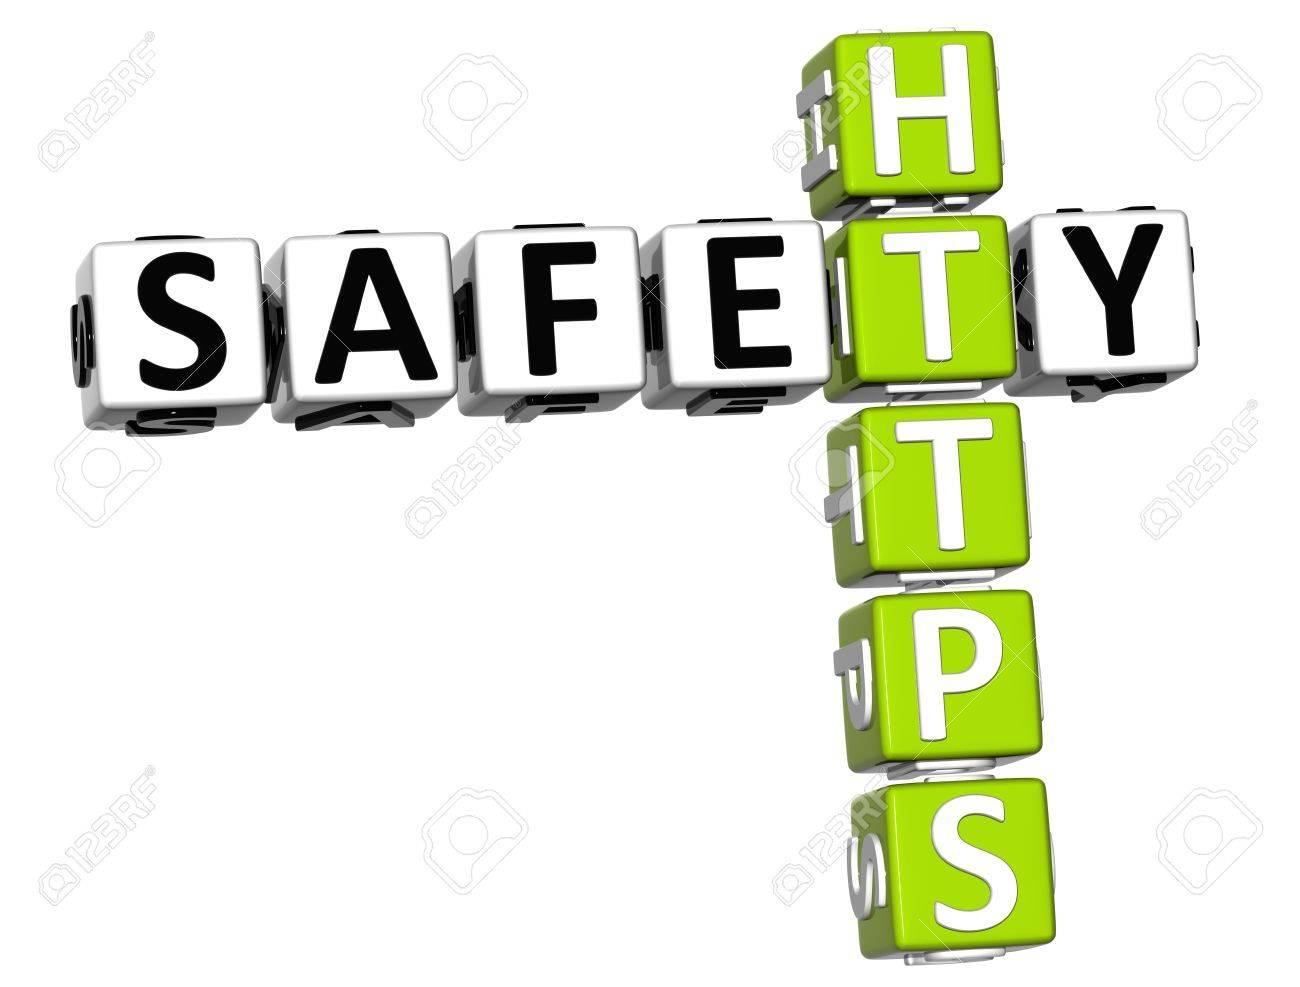 3D Safety Https Crossword on white background Stock Photo - 13925550